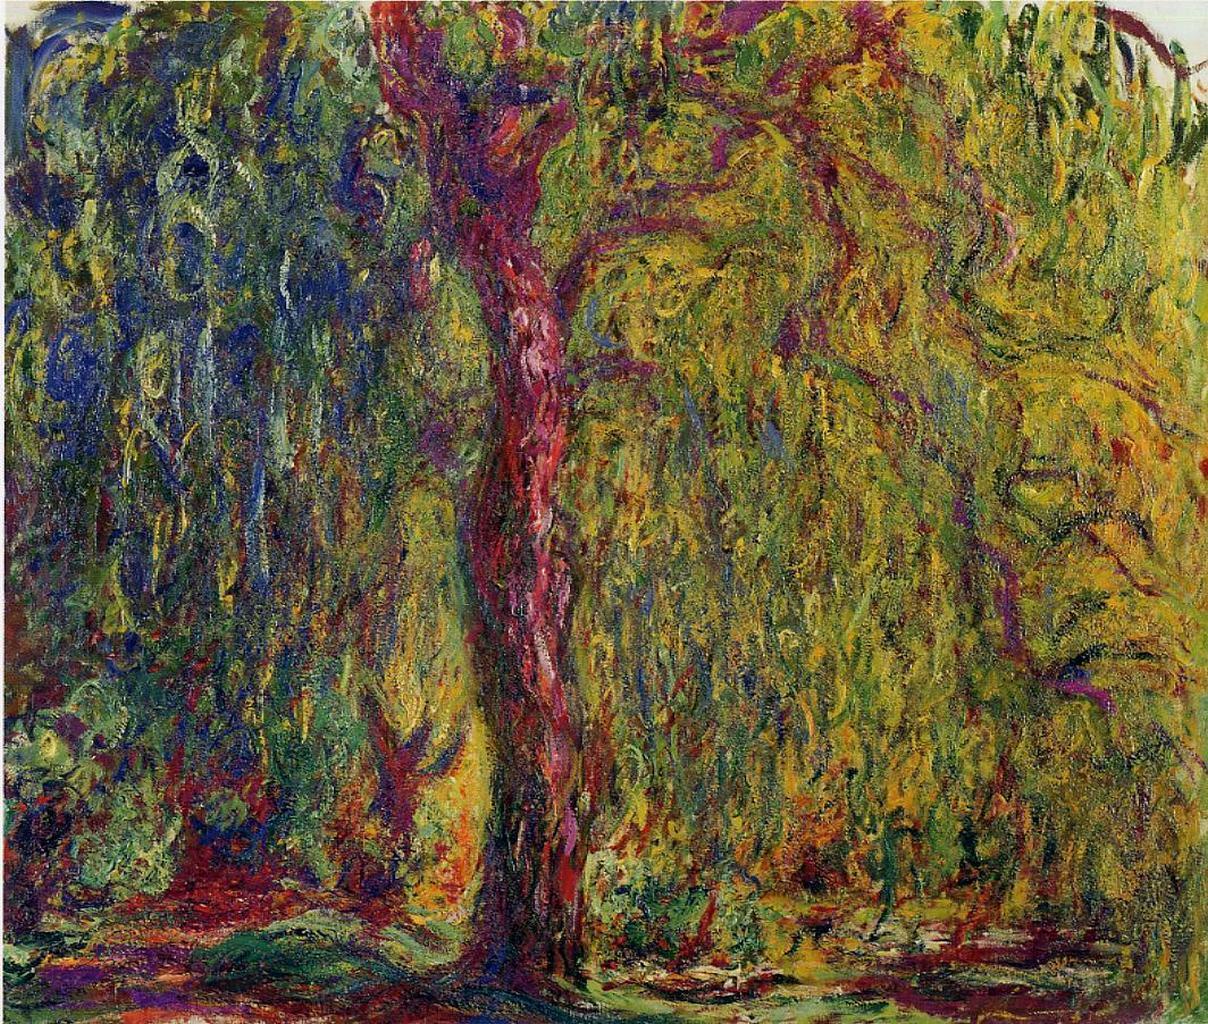 пейзаж < Плакучая ива >:: Клод Моне, описание картины - Моне Клод (Claude Monet) фото